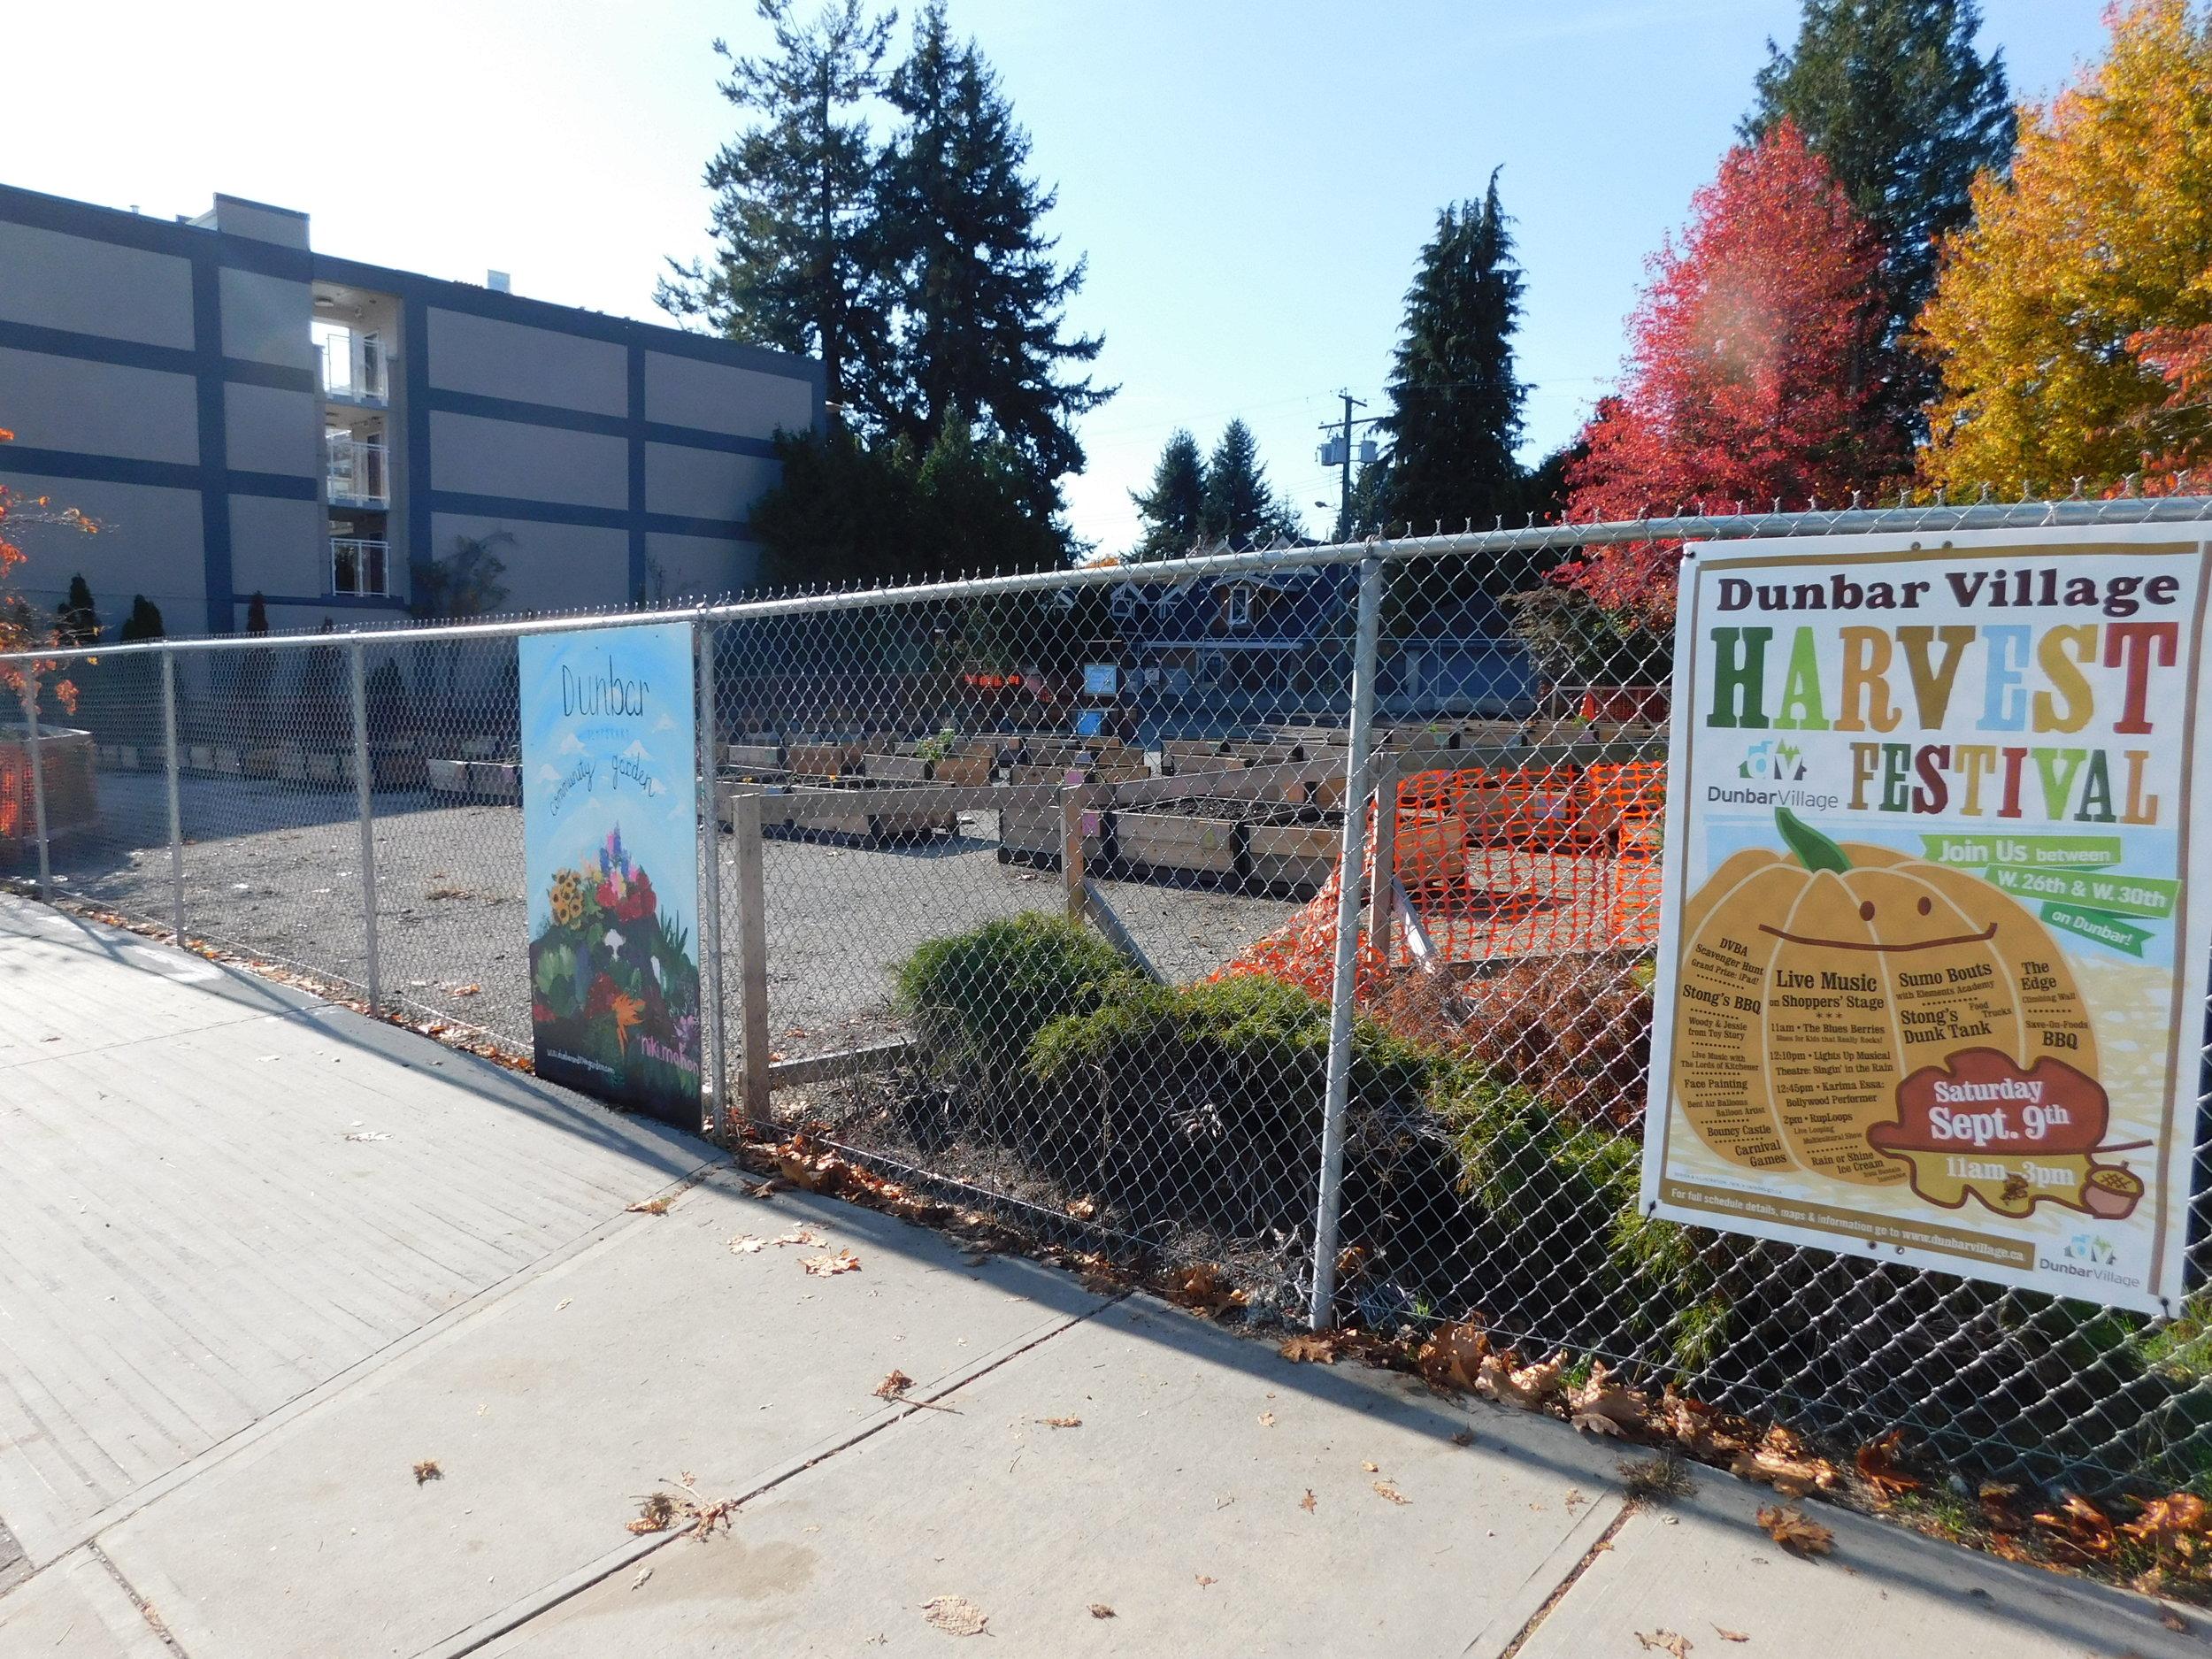 Dunbar_40th_Vancouver_Community_Garden_Builders-0020.JPG